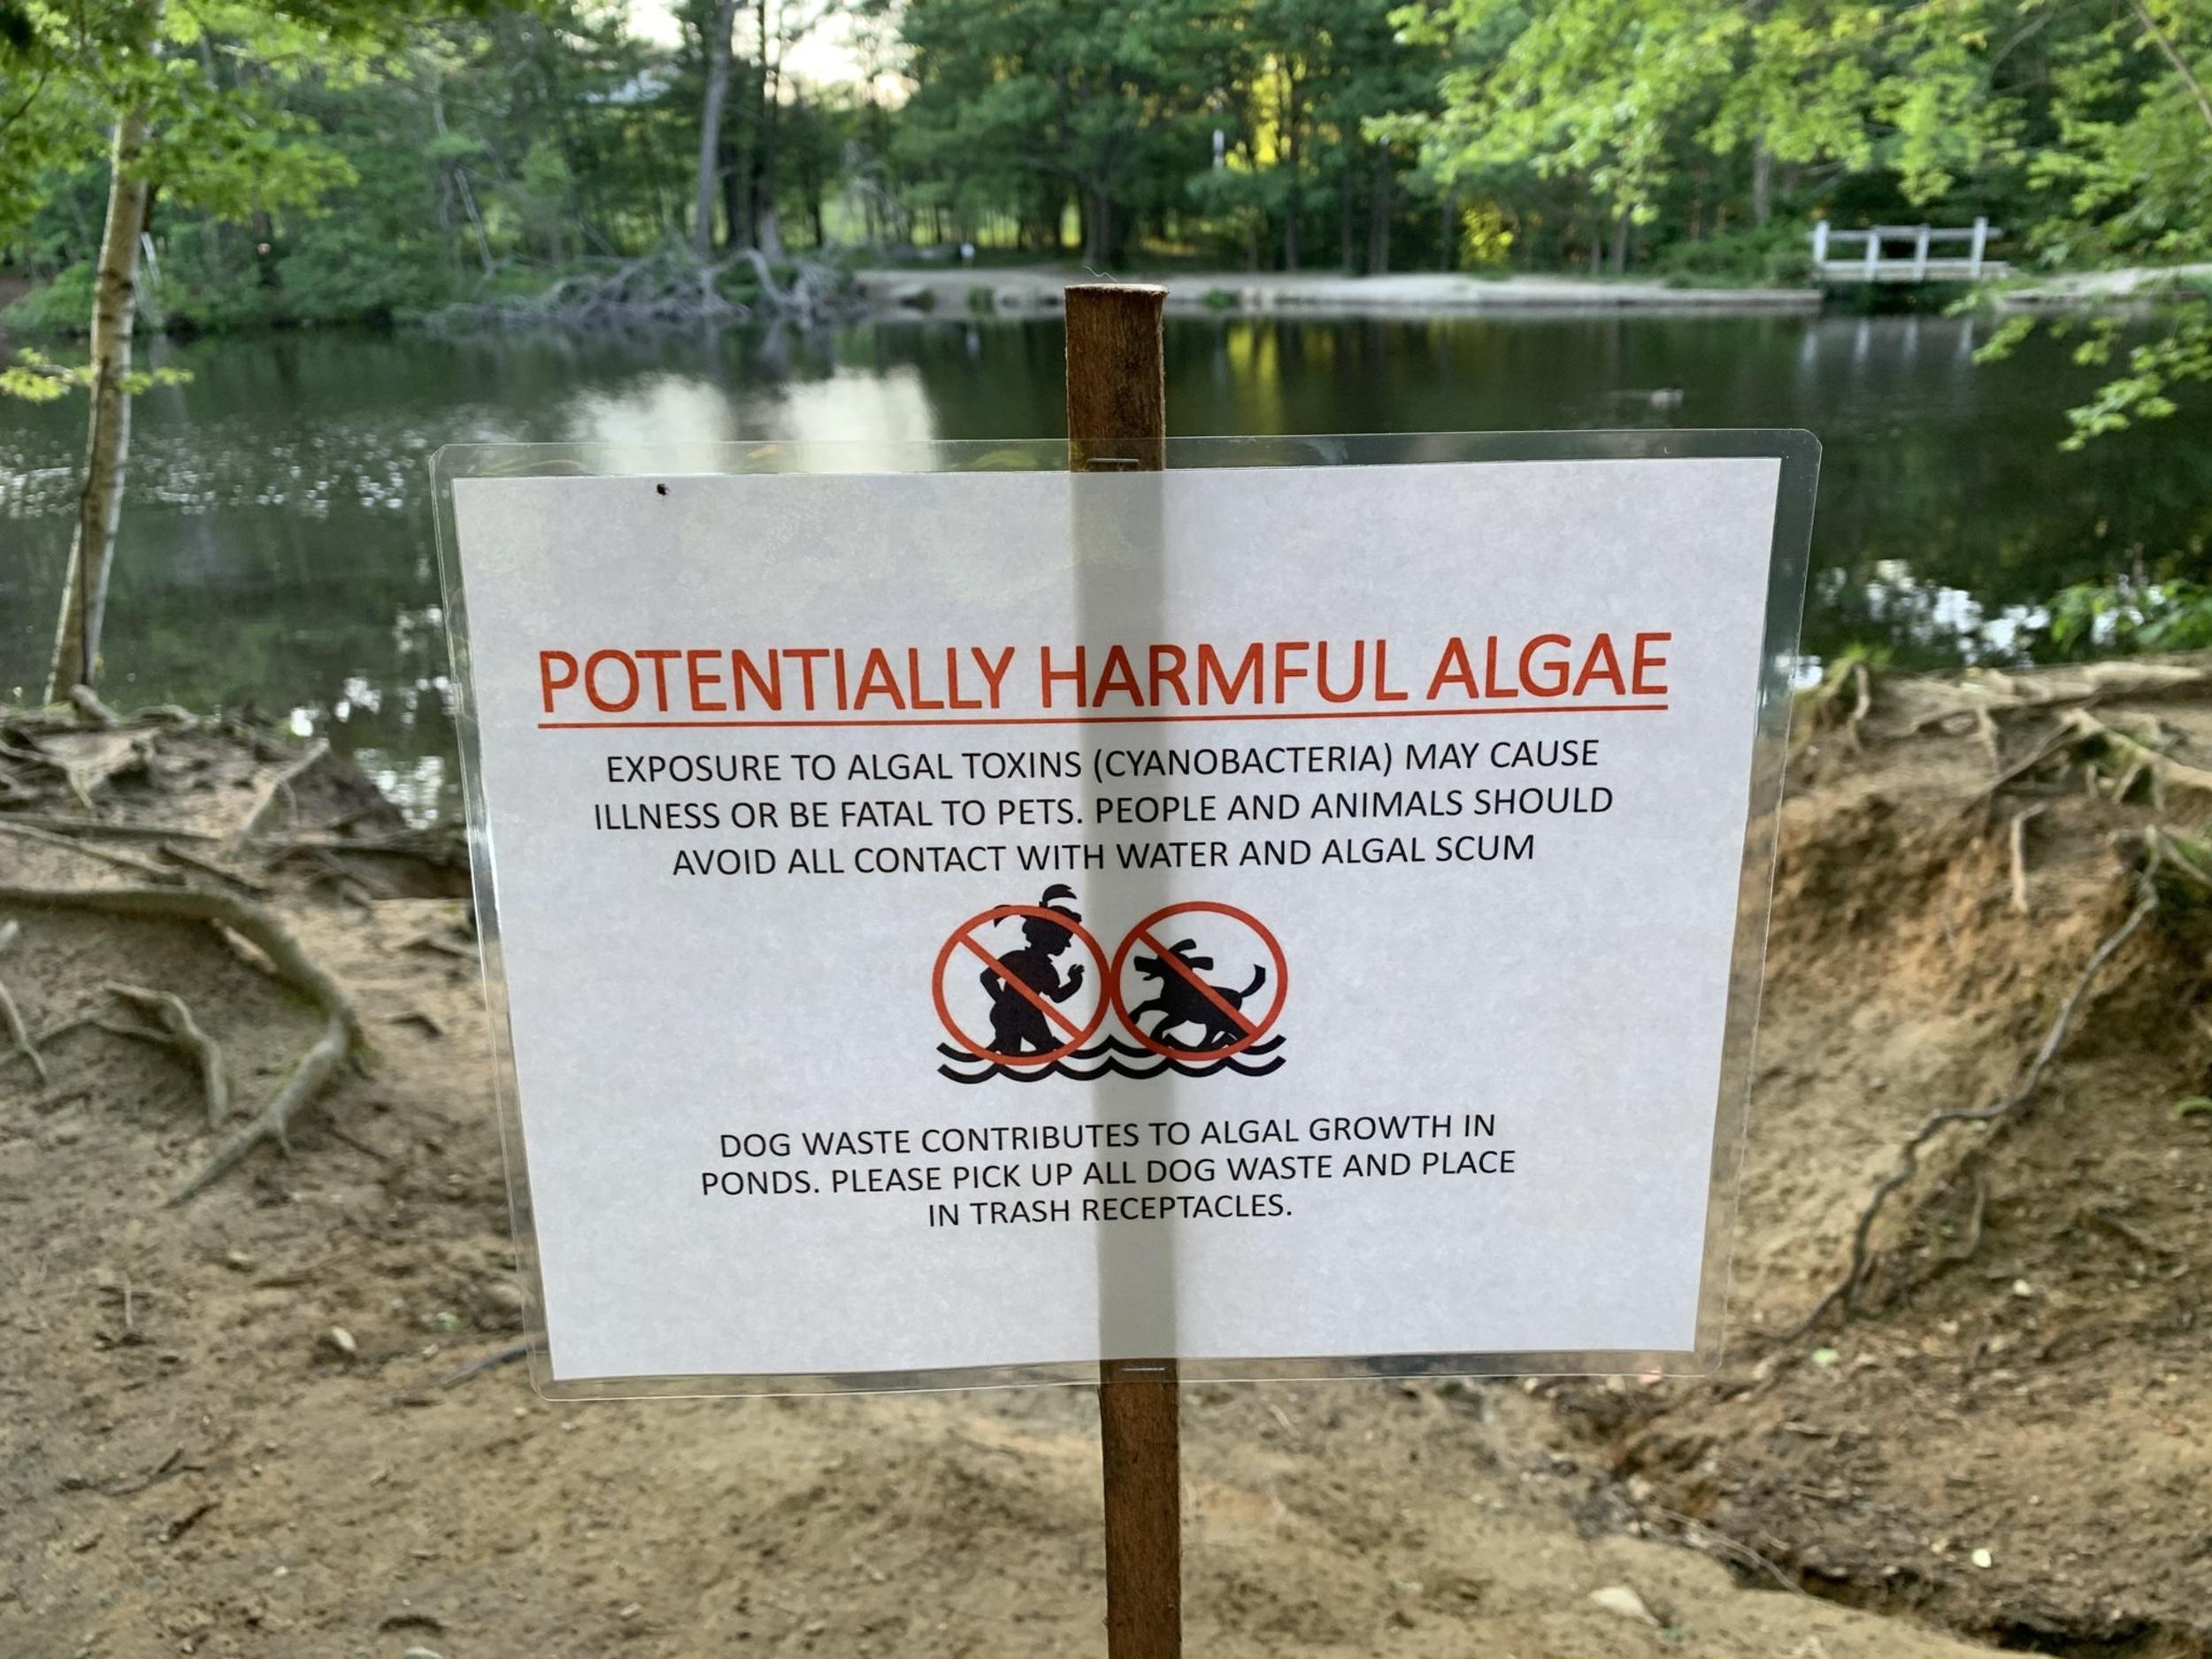 Dog-killing toxic algae may be forming in South Portland park